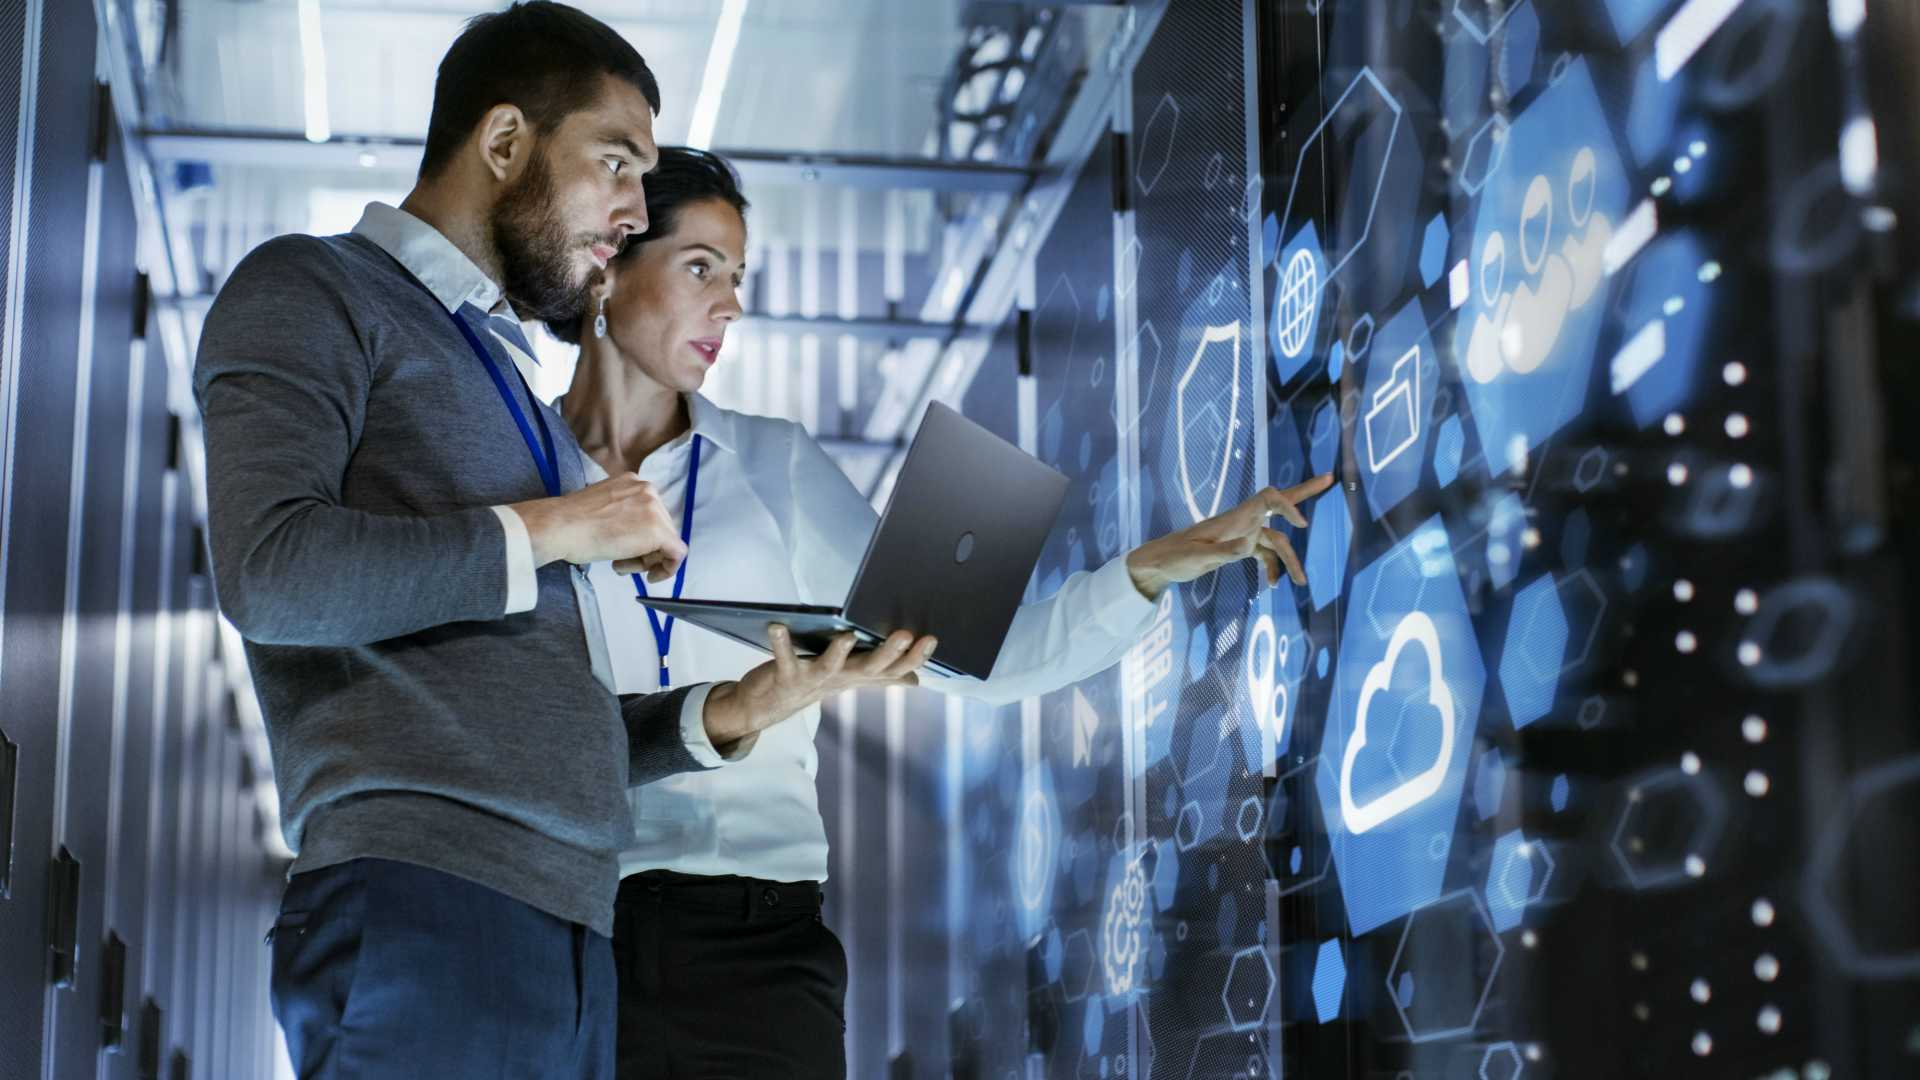 Leadership Development For The Fourth Industrial Revolution